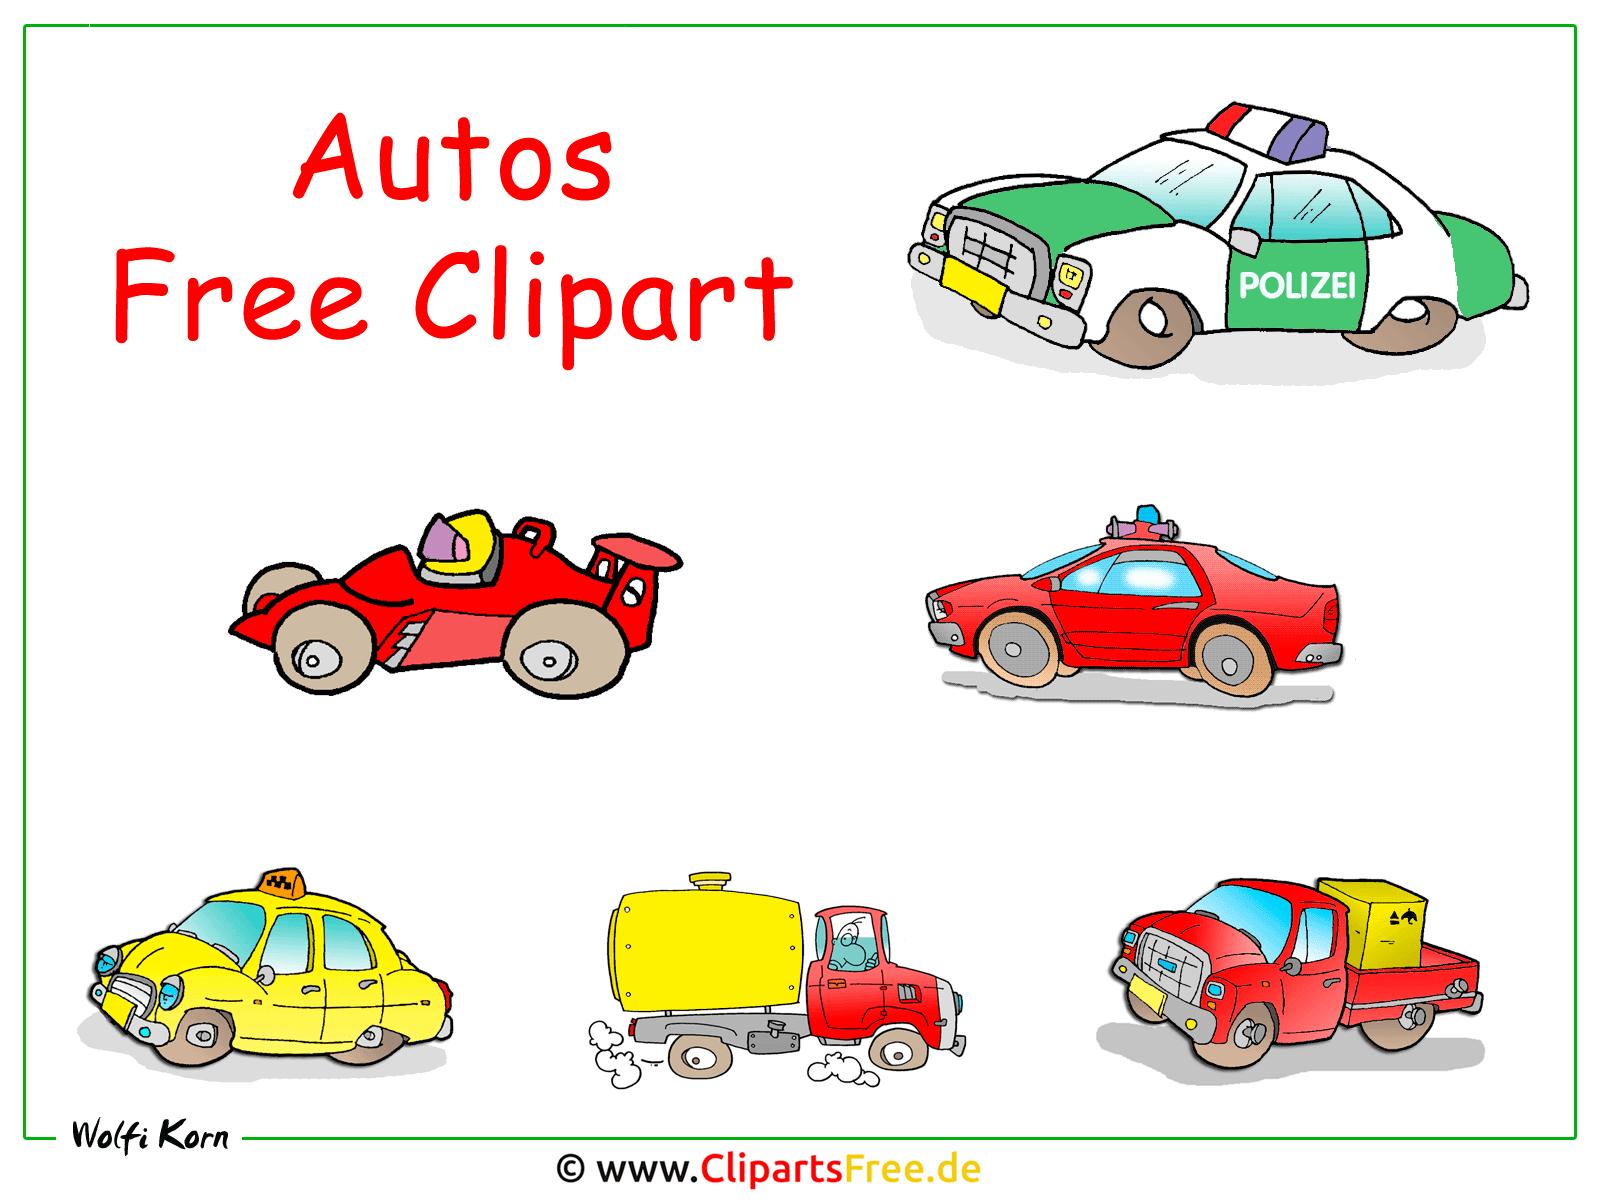 Kostenloses Hintergrundbild Autos Clipart Free